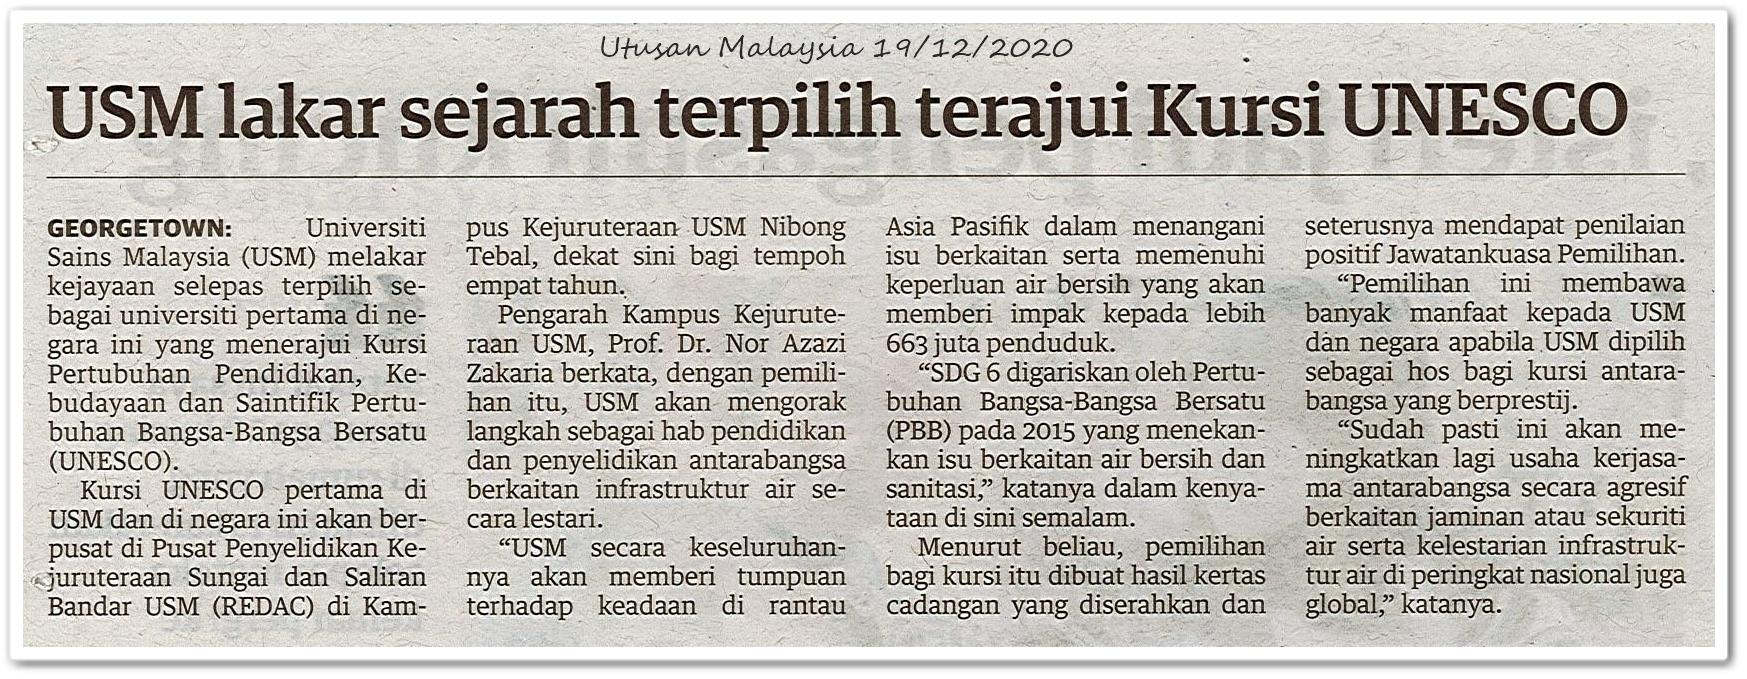 USM lakar sejarah terpilih terajui Kursi UNESCO - Keratan akhbar Utusan Malaysia 19 Disember 2020